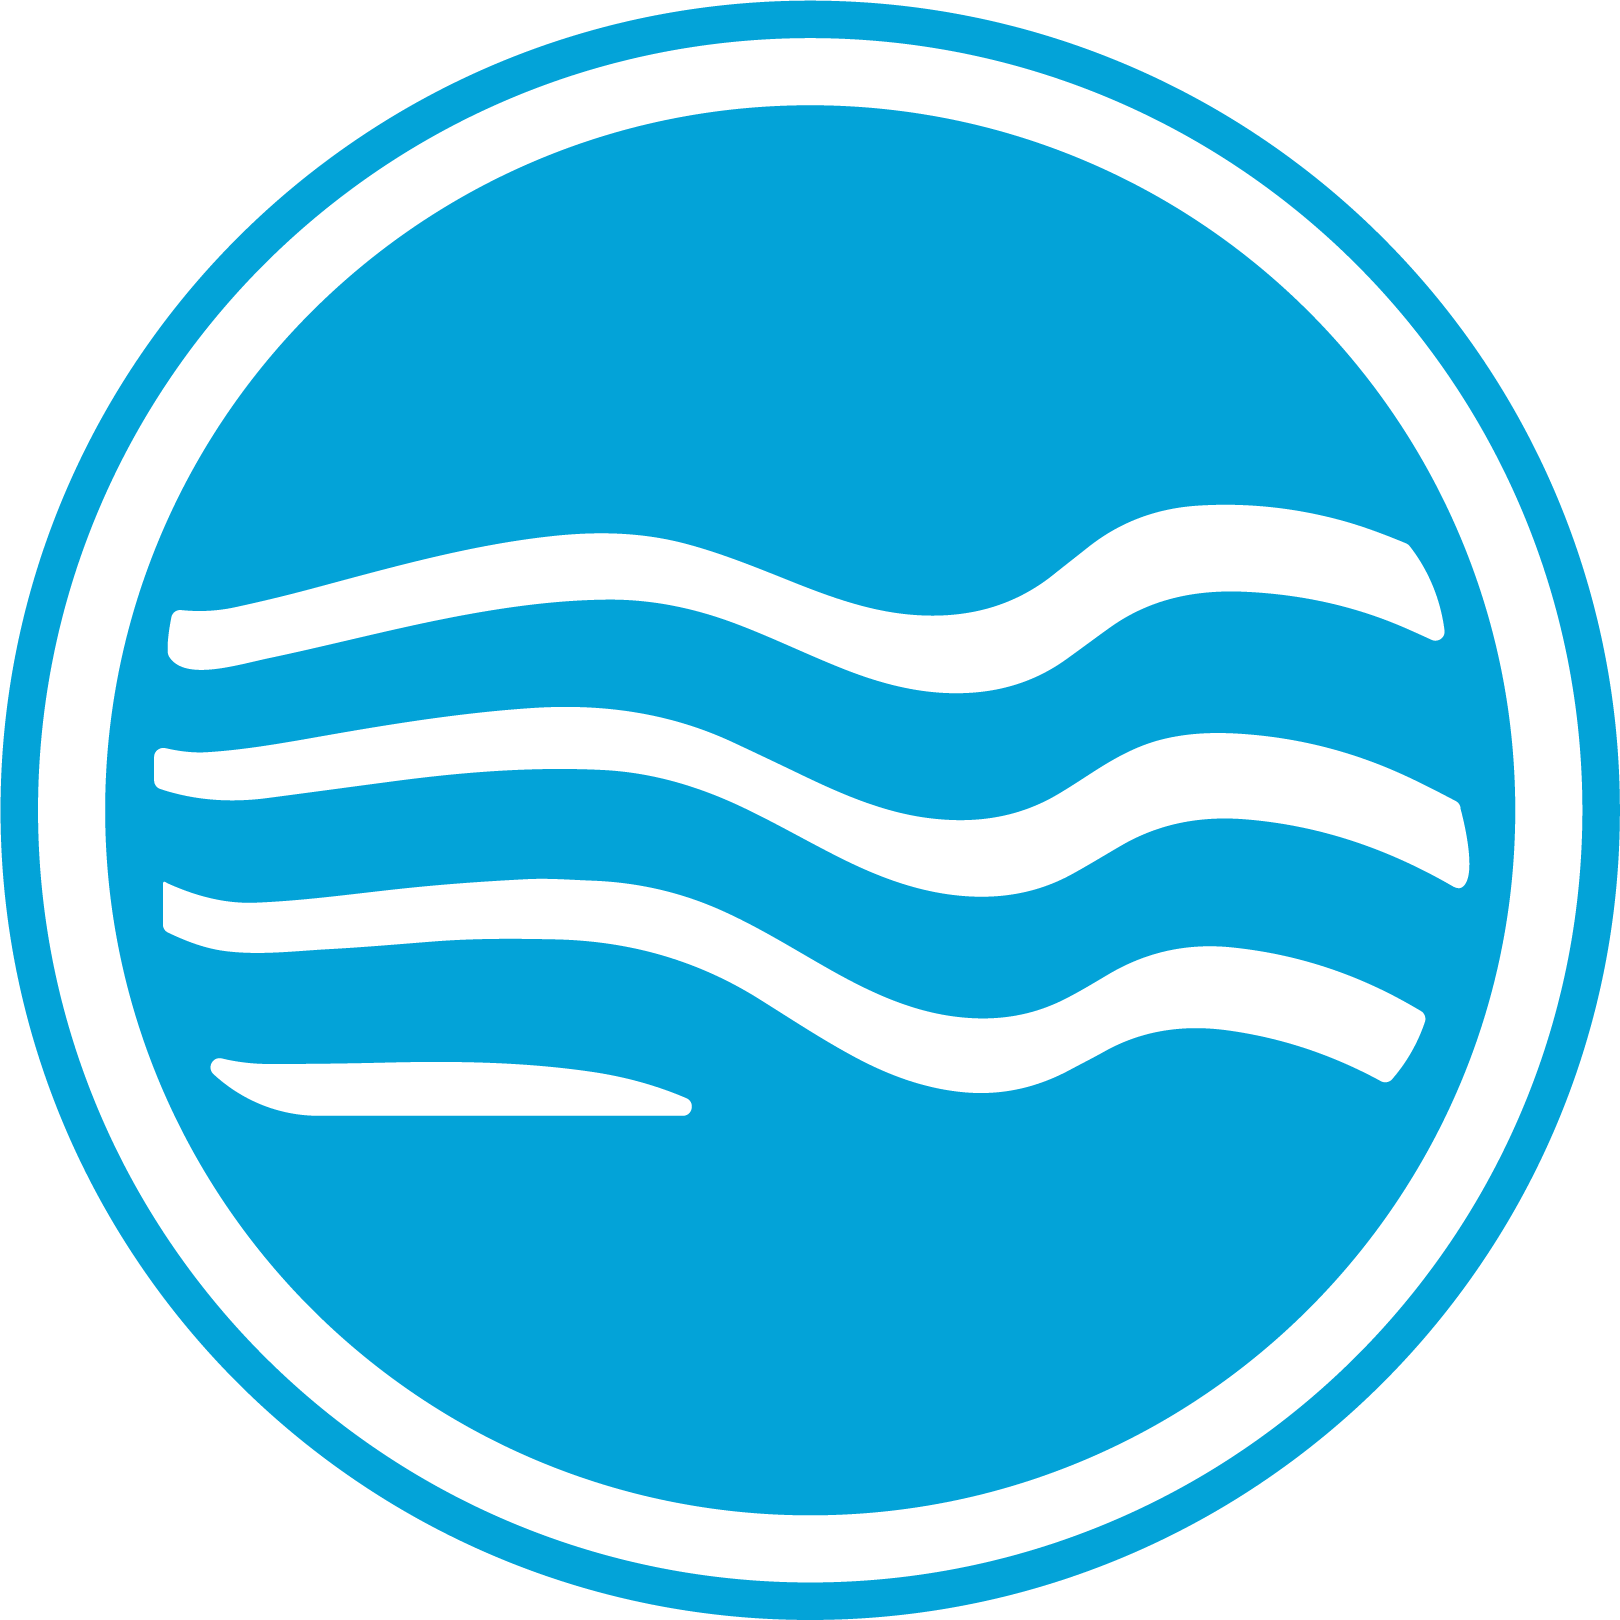 adopt_a_drain_blue.png